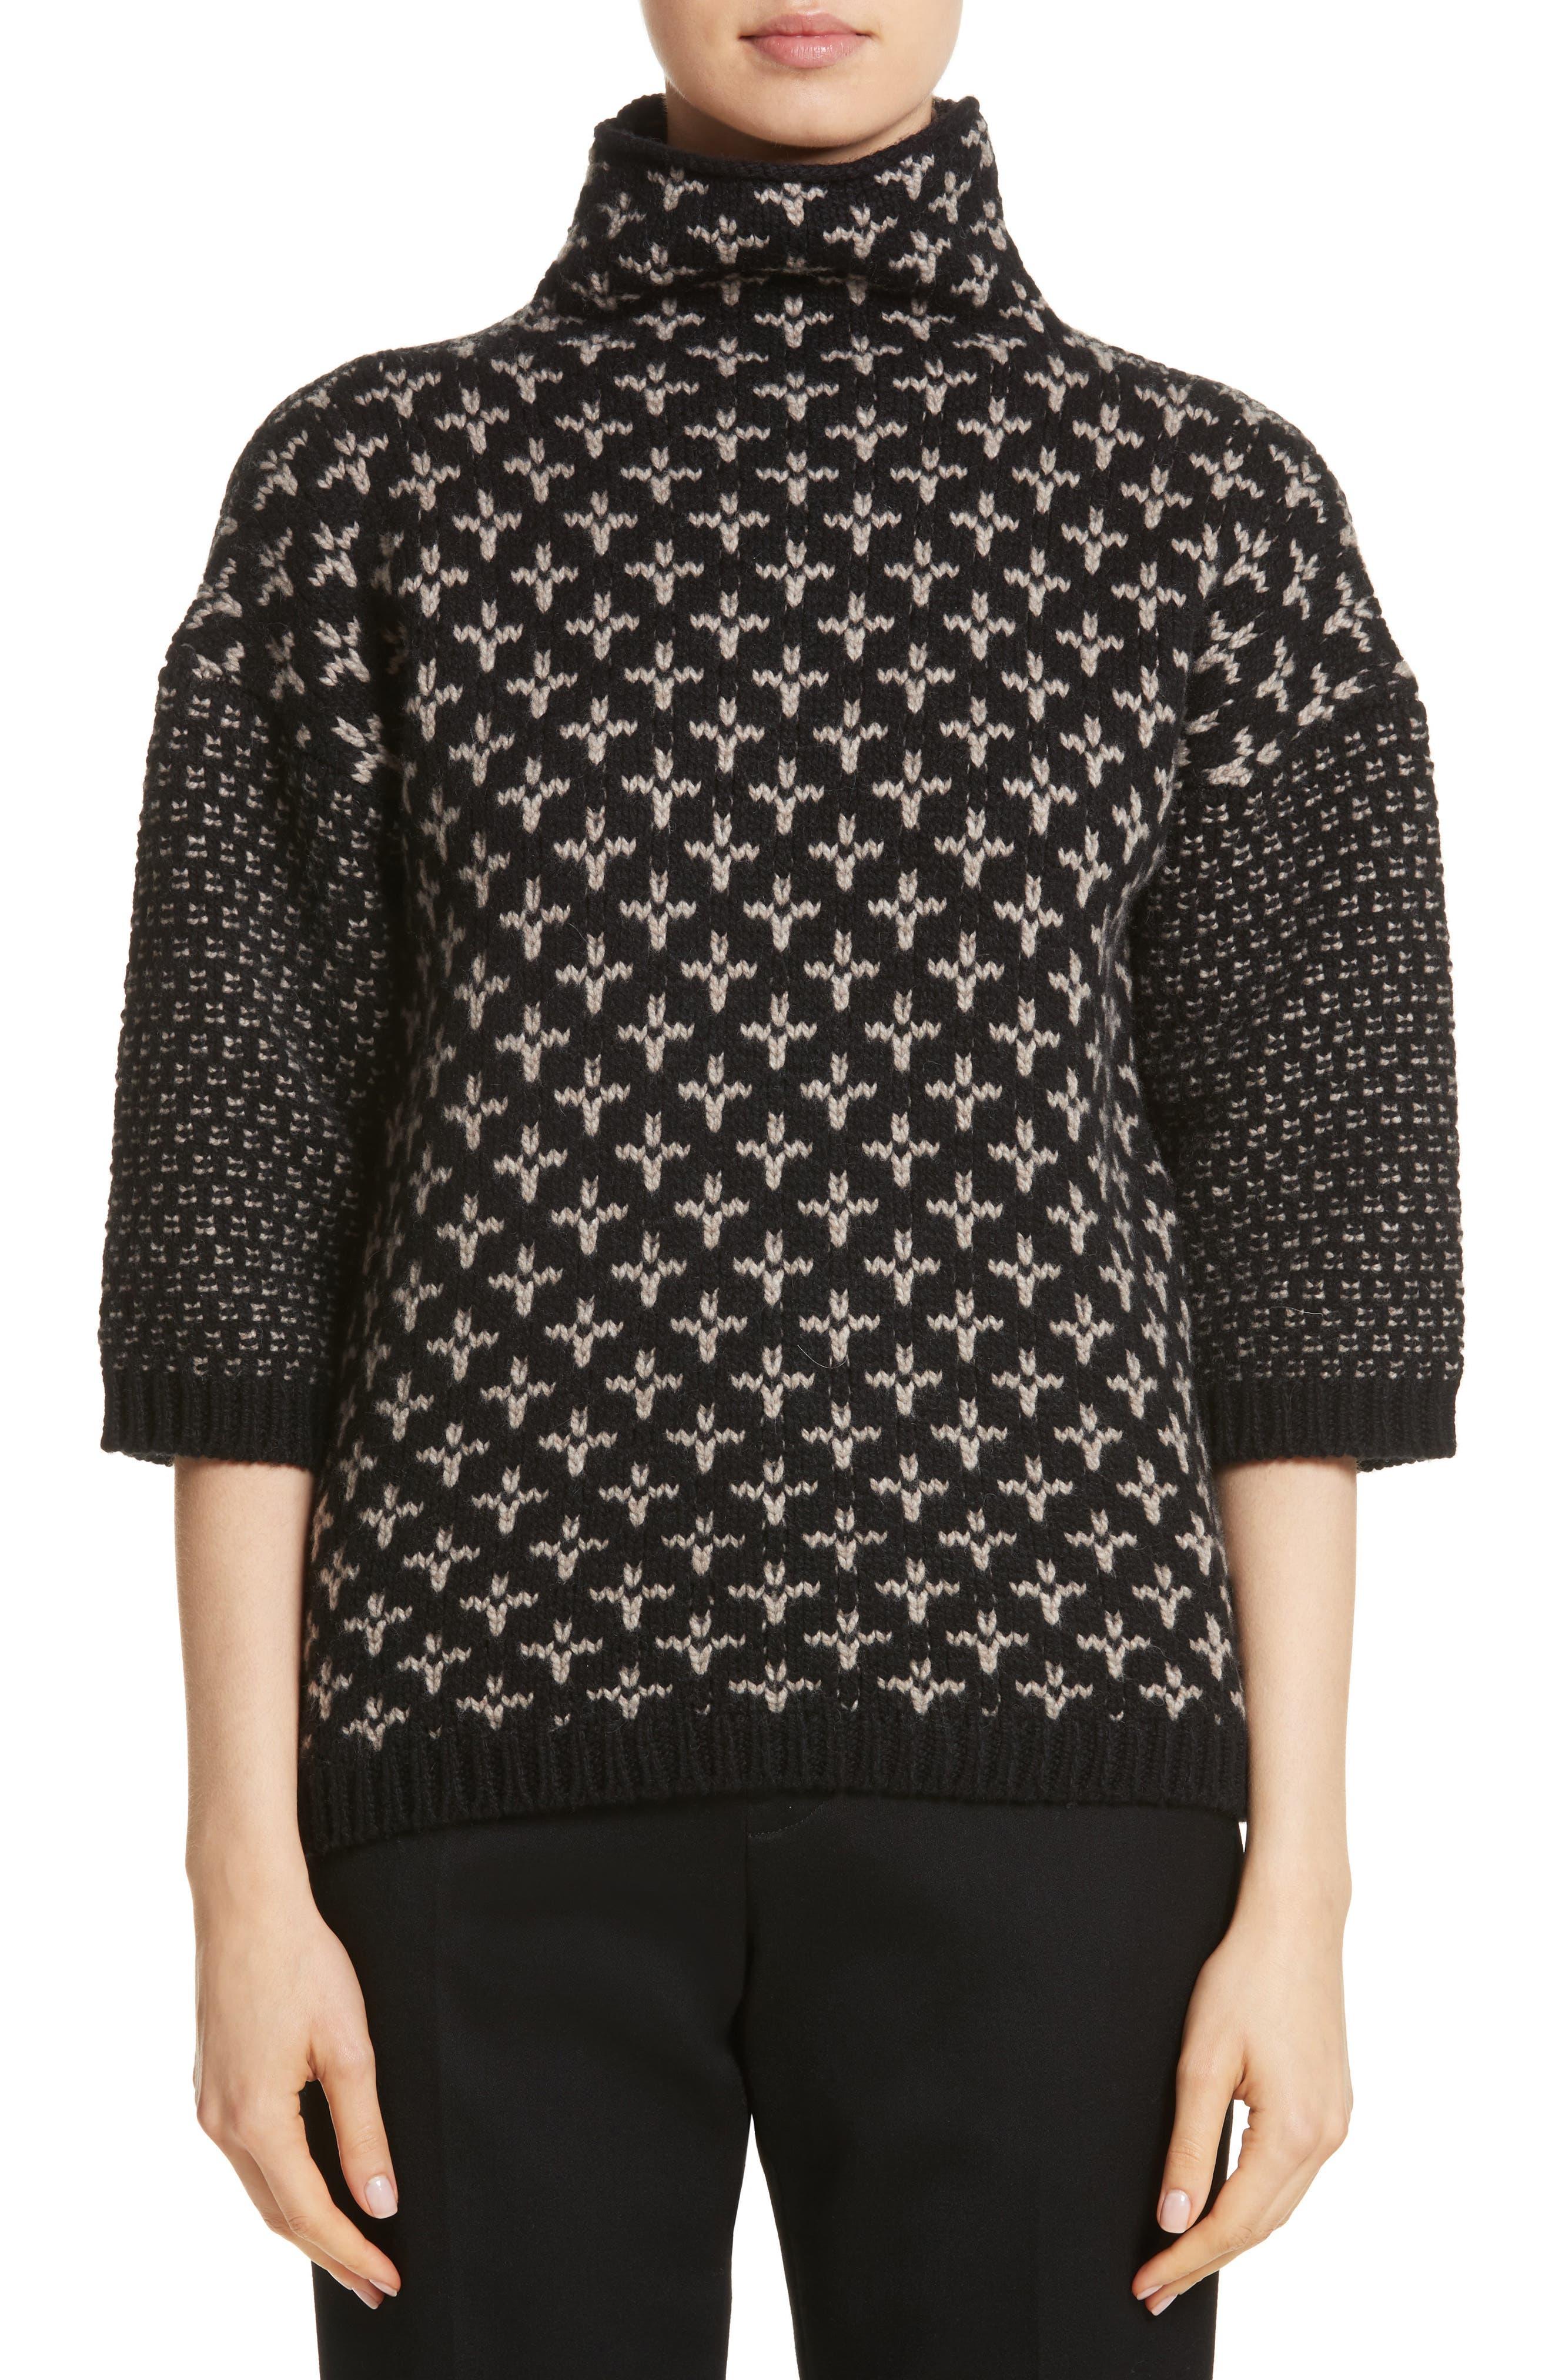 Main Image - Max Mara Rana Wool & Cashmere Sweater